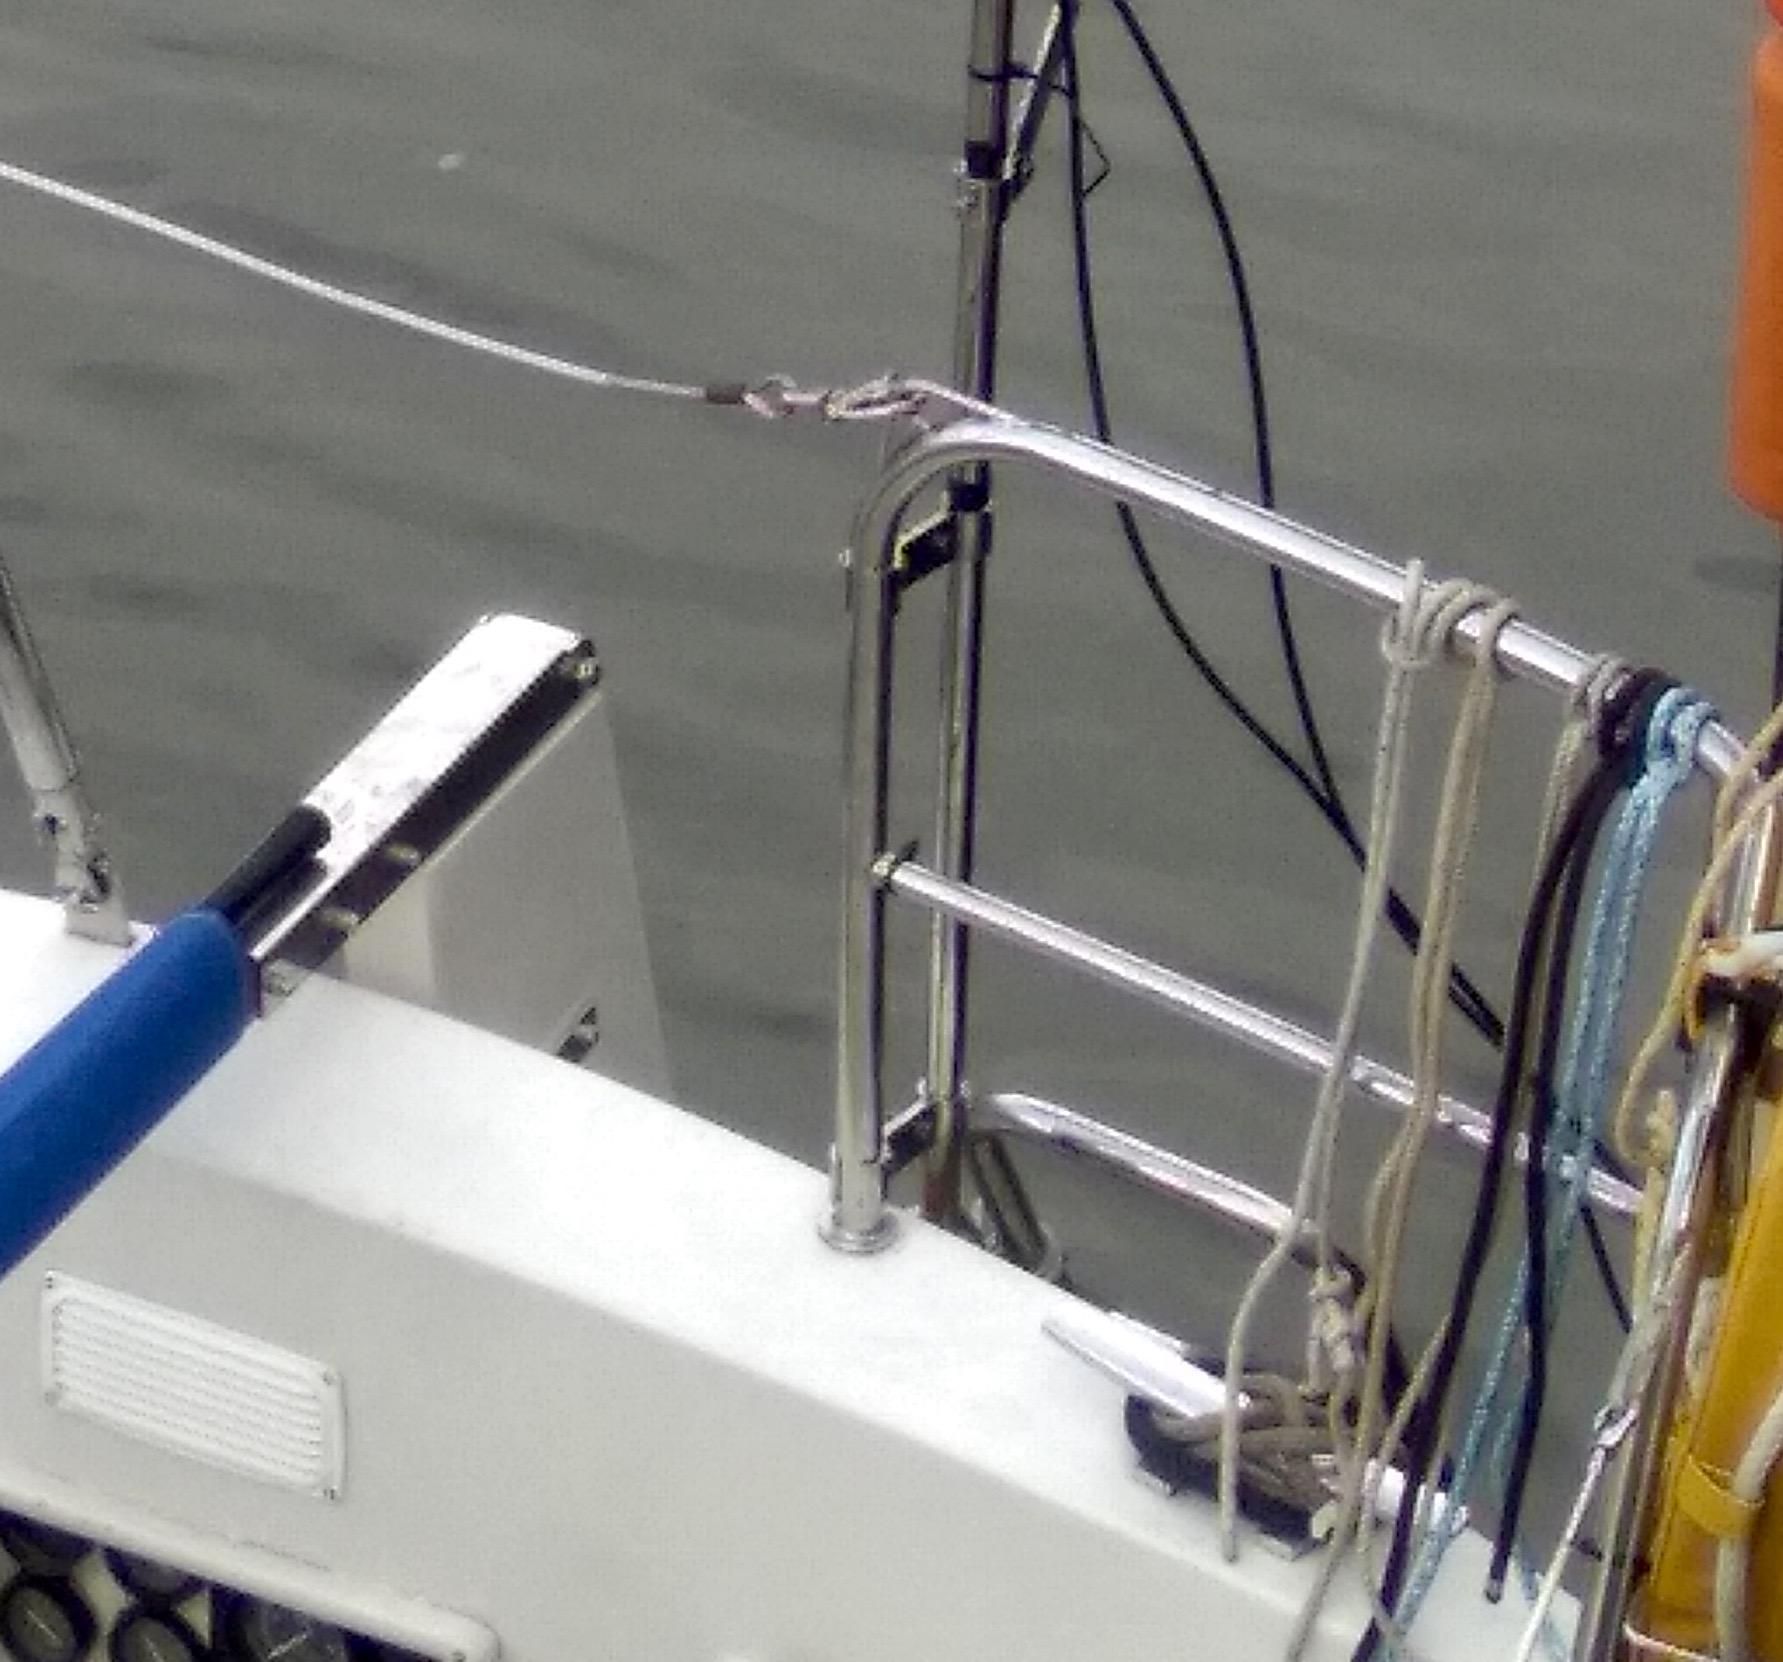 30mm 22mm Pole Bracket For Marine Solar Panel Installation